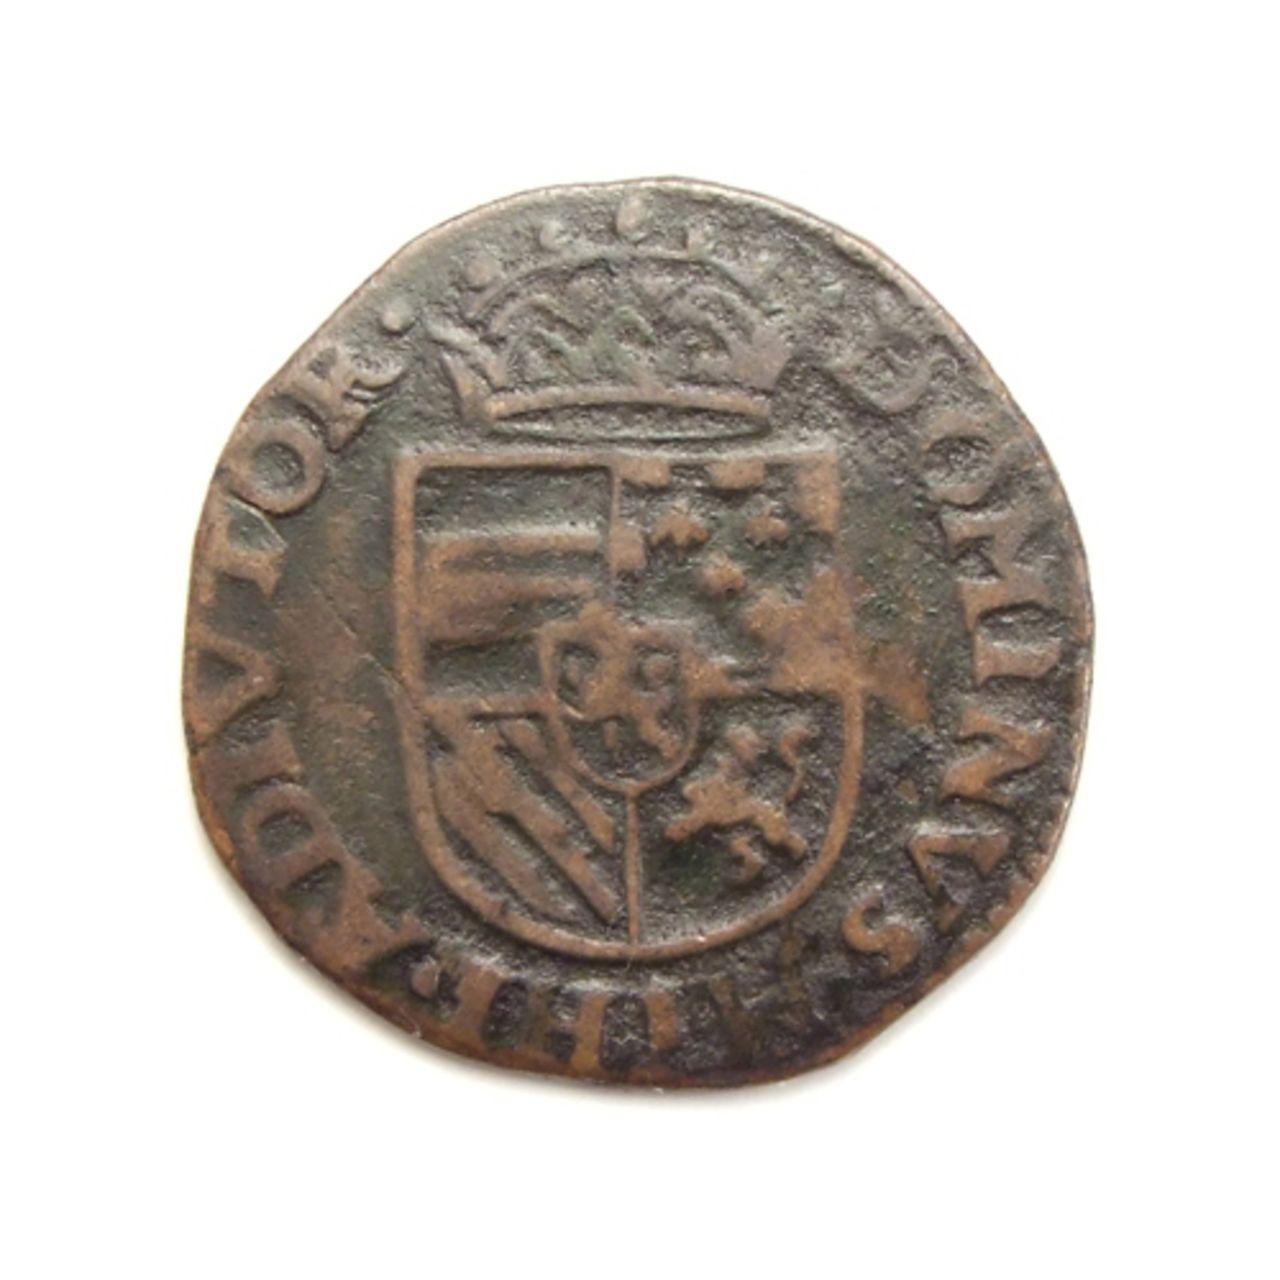 Hertogelijke Oord o Liard 1582. Felipe II. Doornik (Tournai). Spaanse_nederlanden_doornik_oord_1582_5034_1